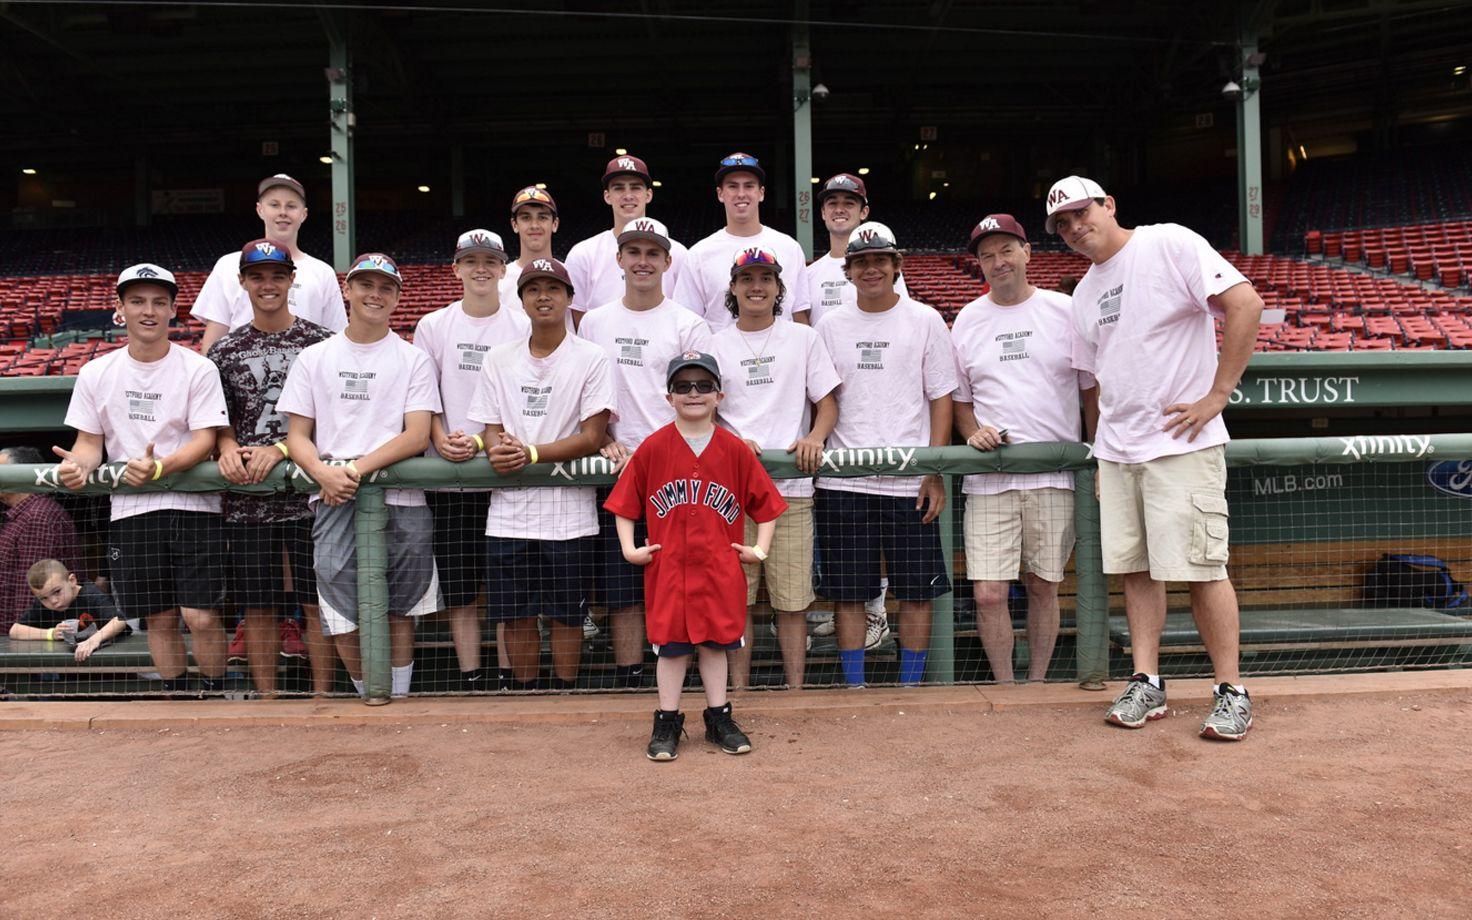 Last year westford academys baseball team raised nearly